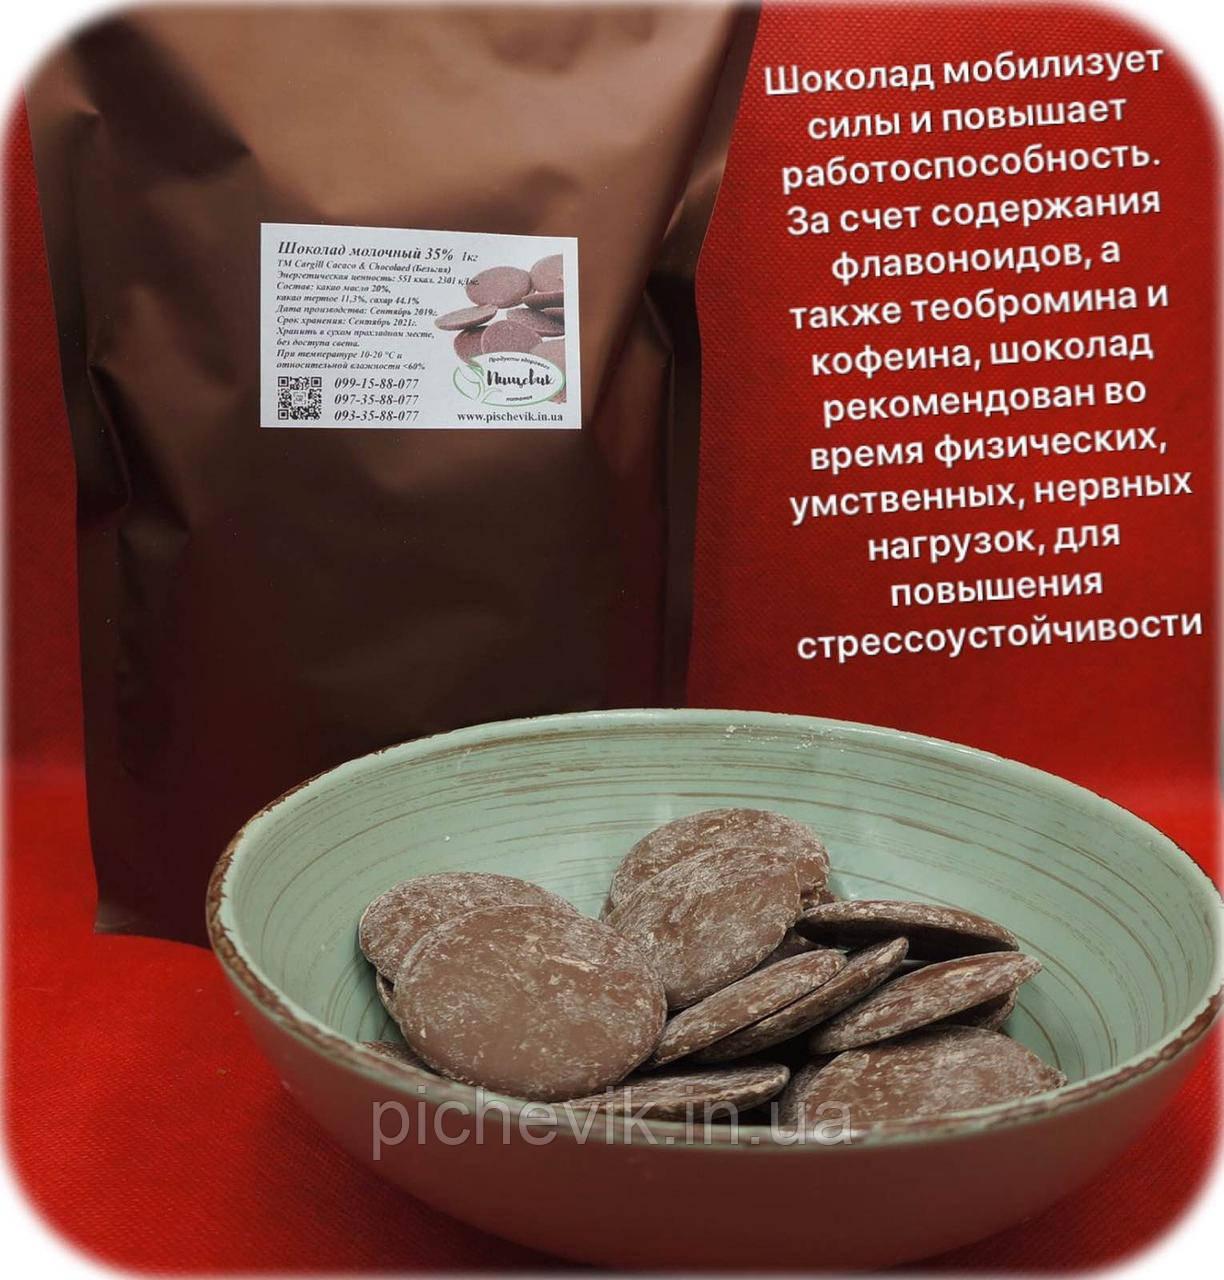 Молочный шоколад 35% ТМ Сargill Cacaco & Chocolaed (Бельгия) Вес: 250 гр